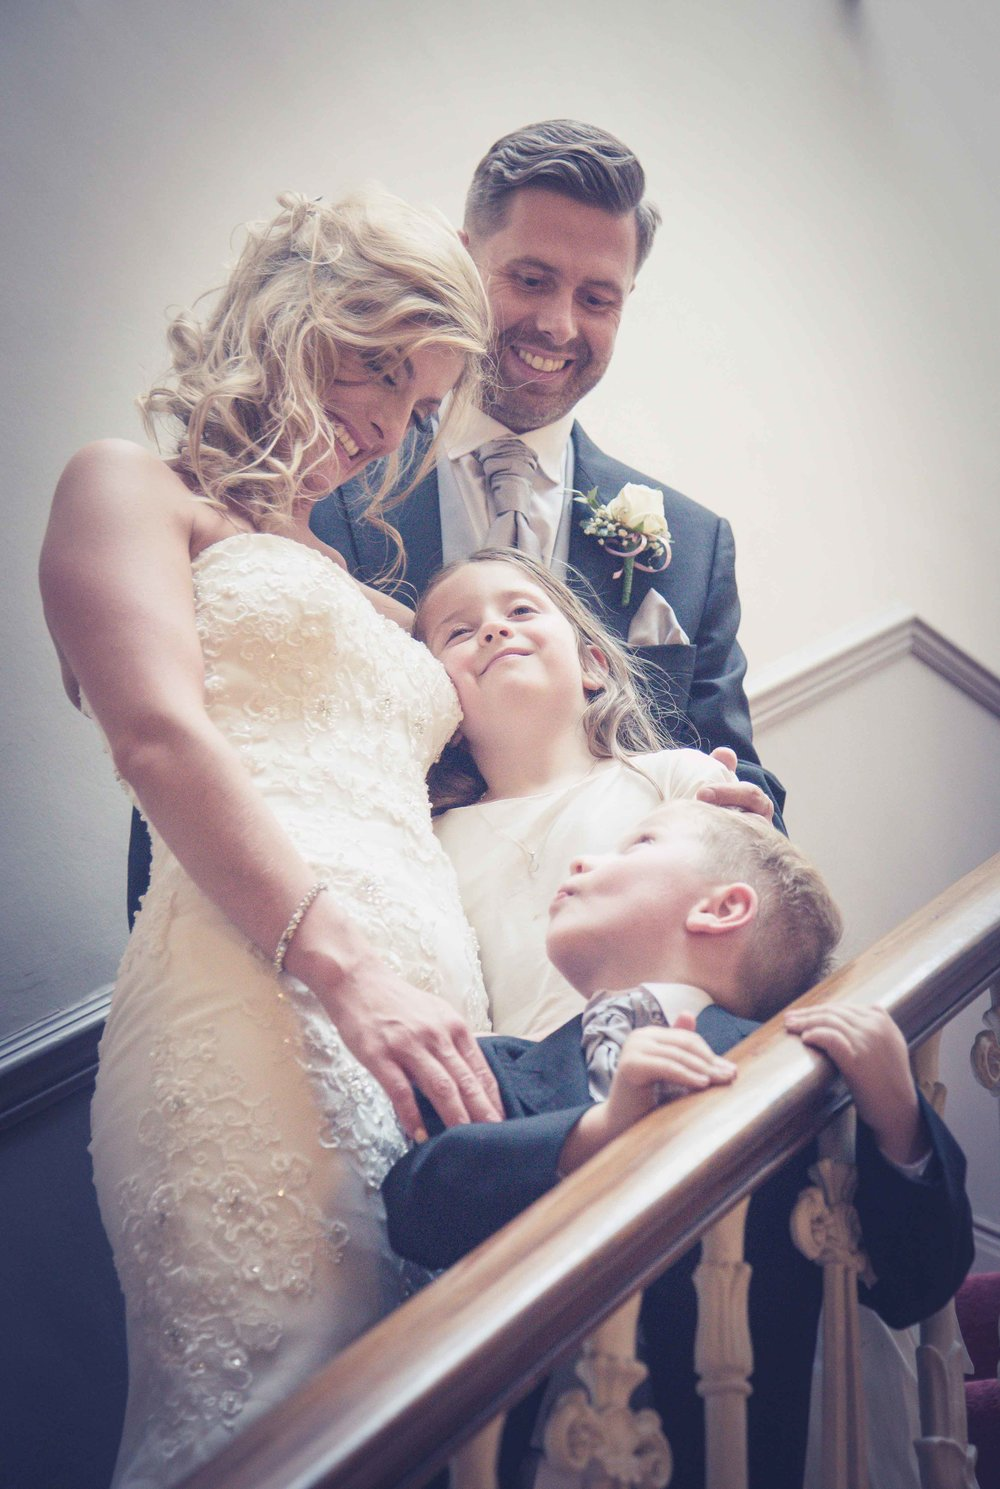 Rauquet_Club_Wedding_photography_Liverpool_heatherelizabethphotography (143 of 164).jpg